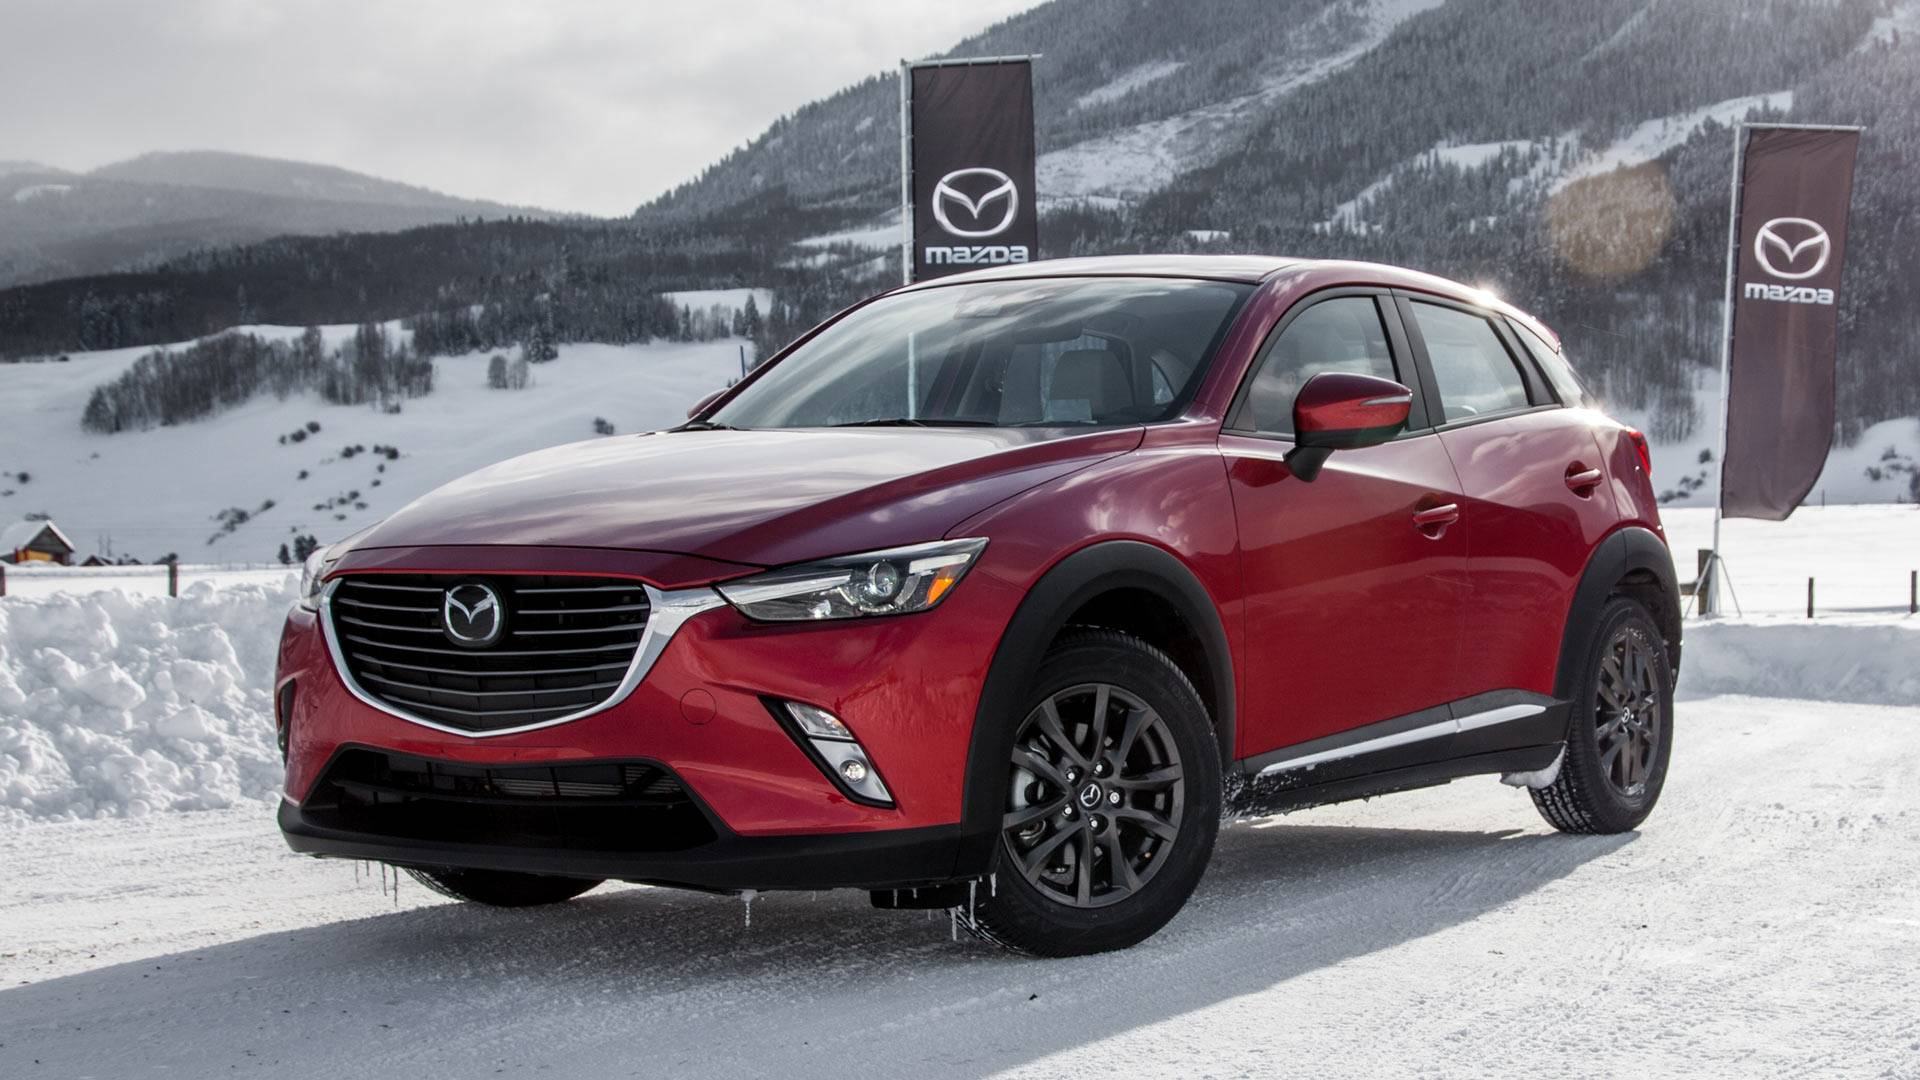 Mazda CX-3 Production For Europe Ending In December - Motor1